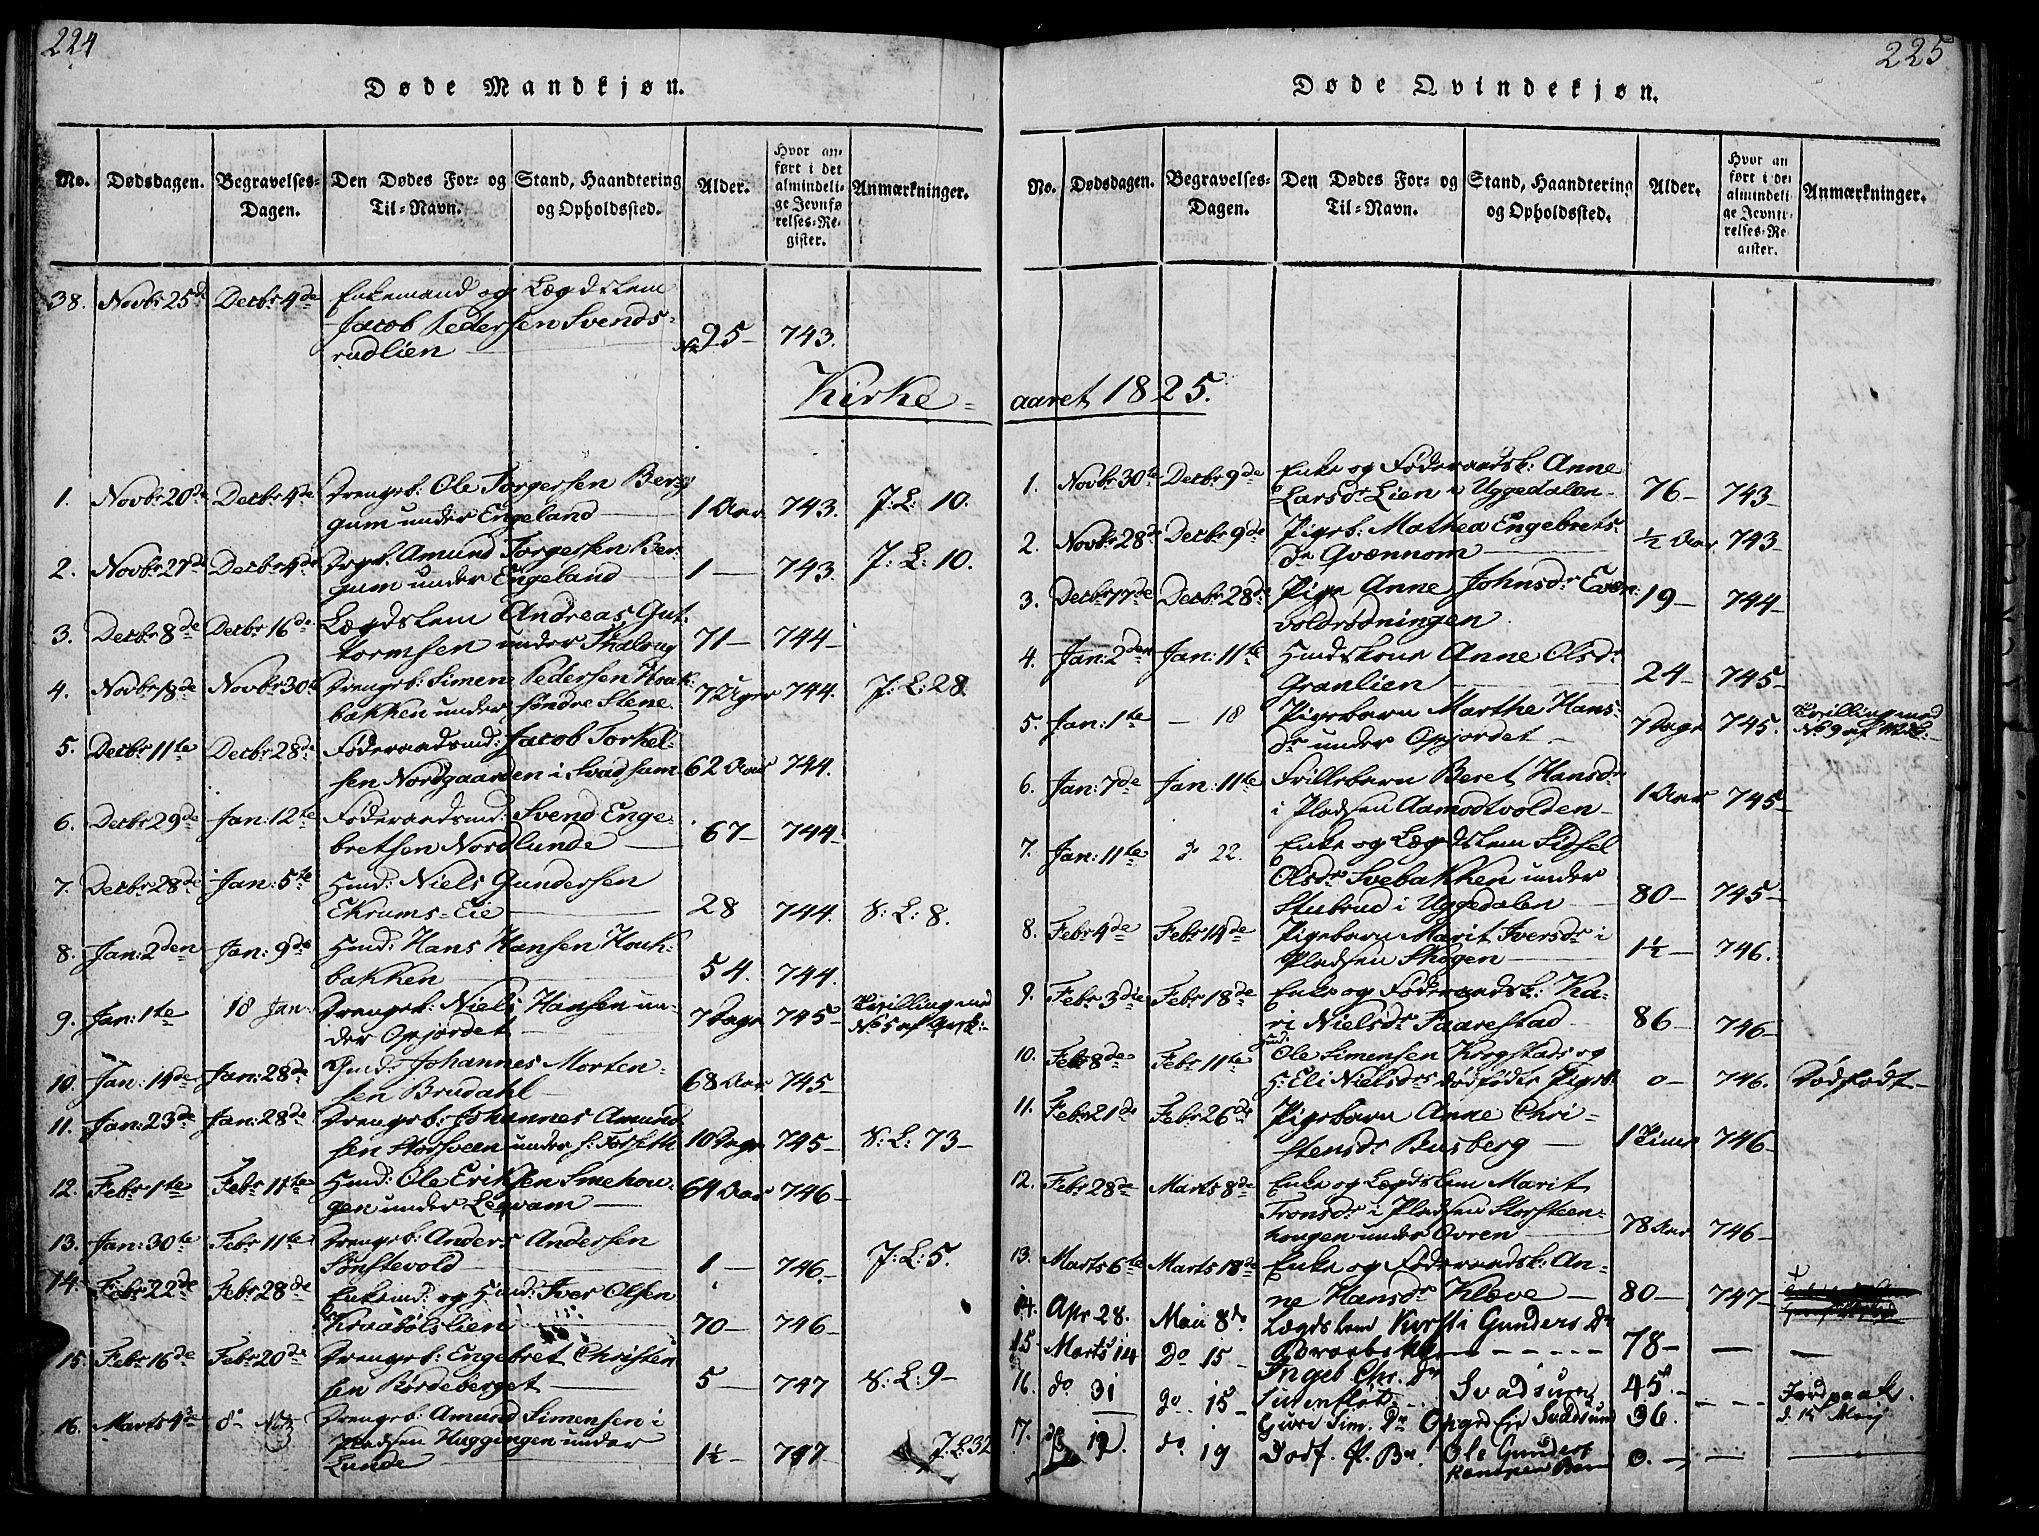 SAH, Gausdal prestekontor, Ministerialbok nr. 5, 1817-1829, s. 224-225